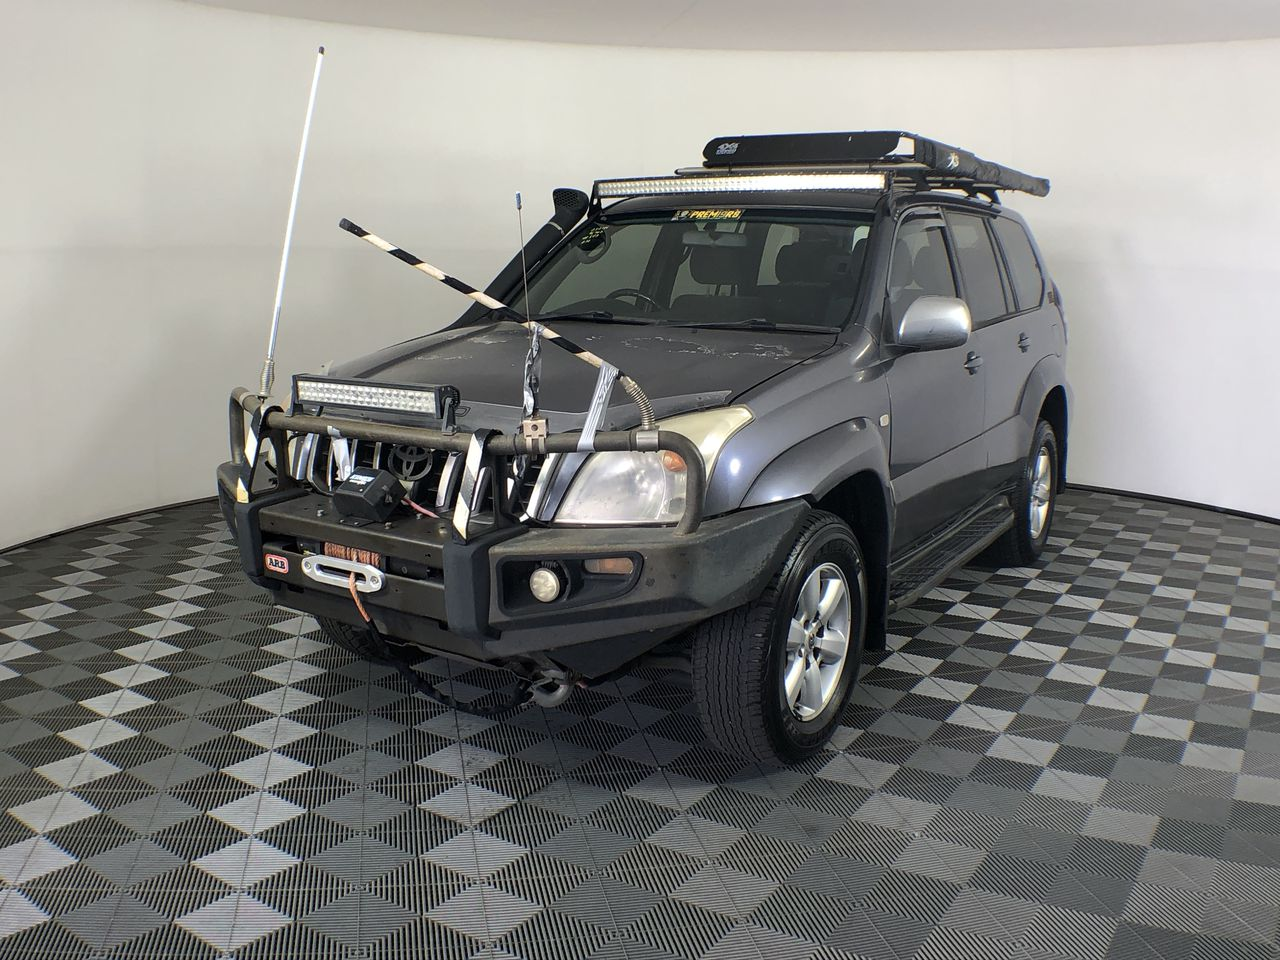 2004 Toyota Landcruiser Prado GXL (4x4) KZJ120R T/Diesel Auto 8 Seats Wagon